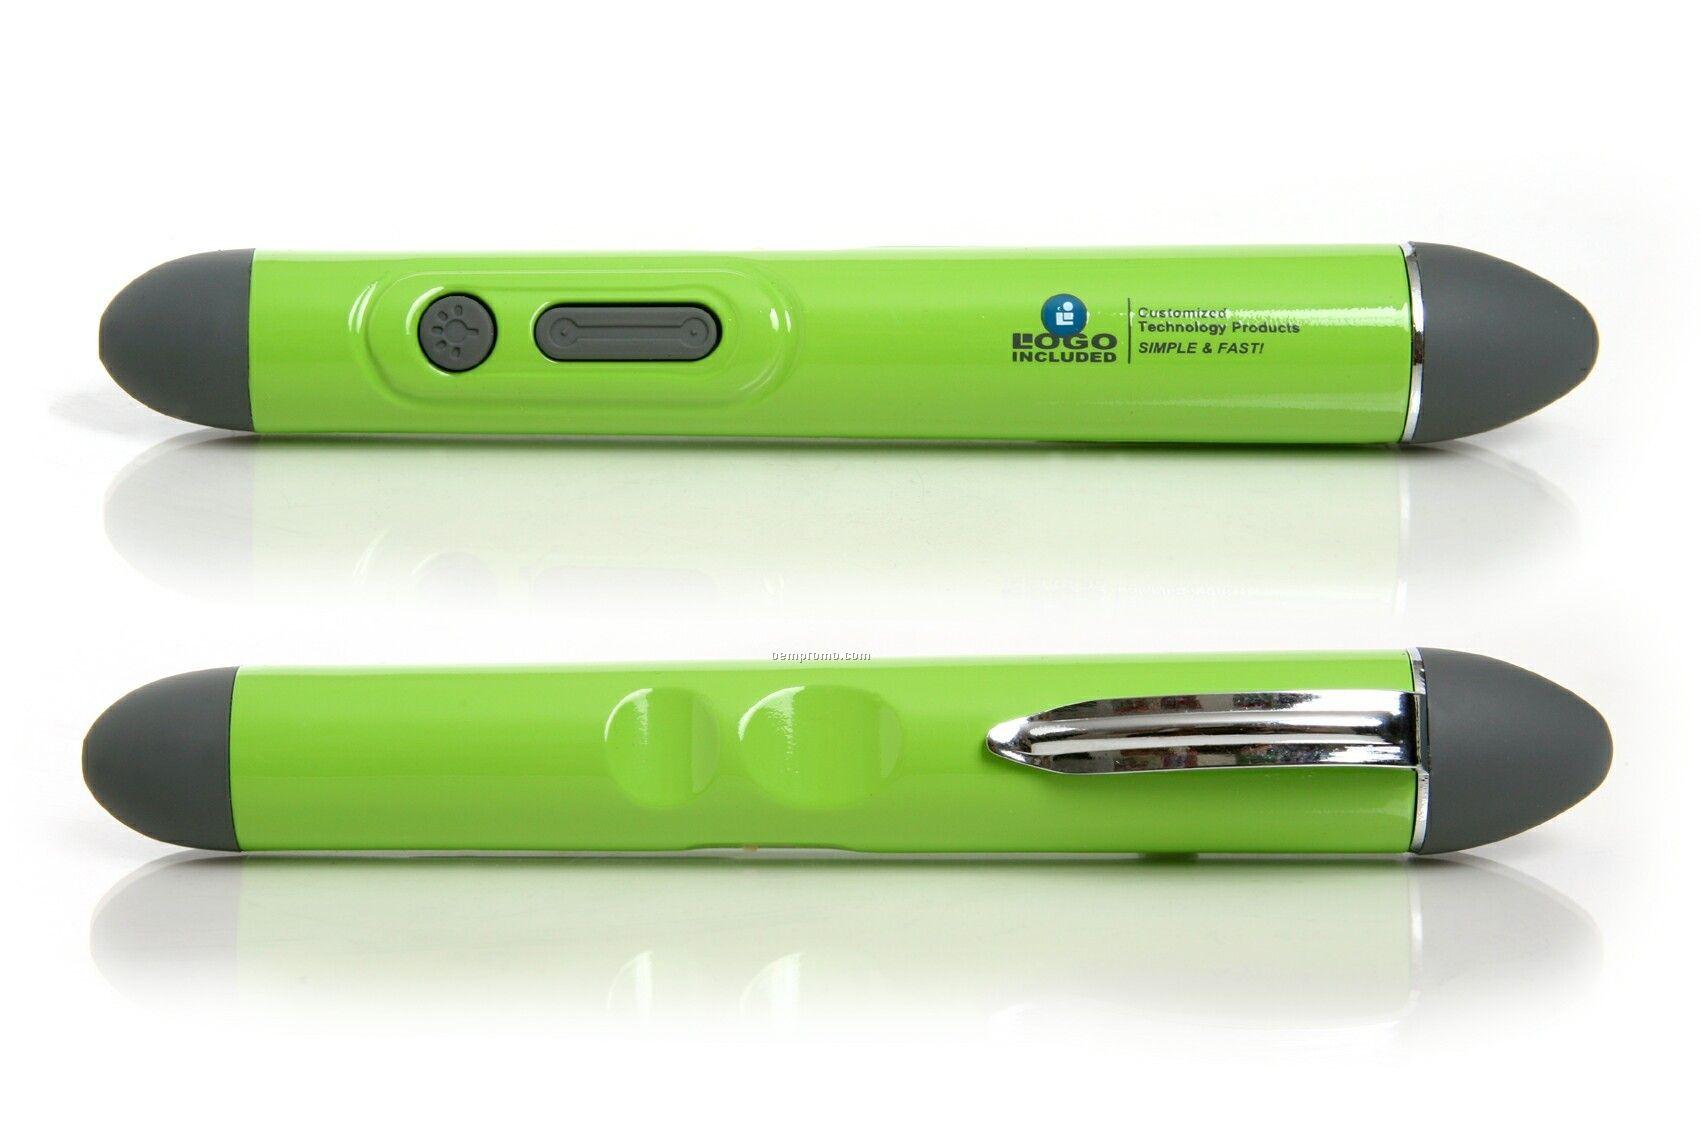 Ultra Wireless Presenter (2 GB USB memory)